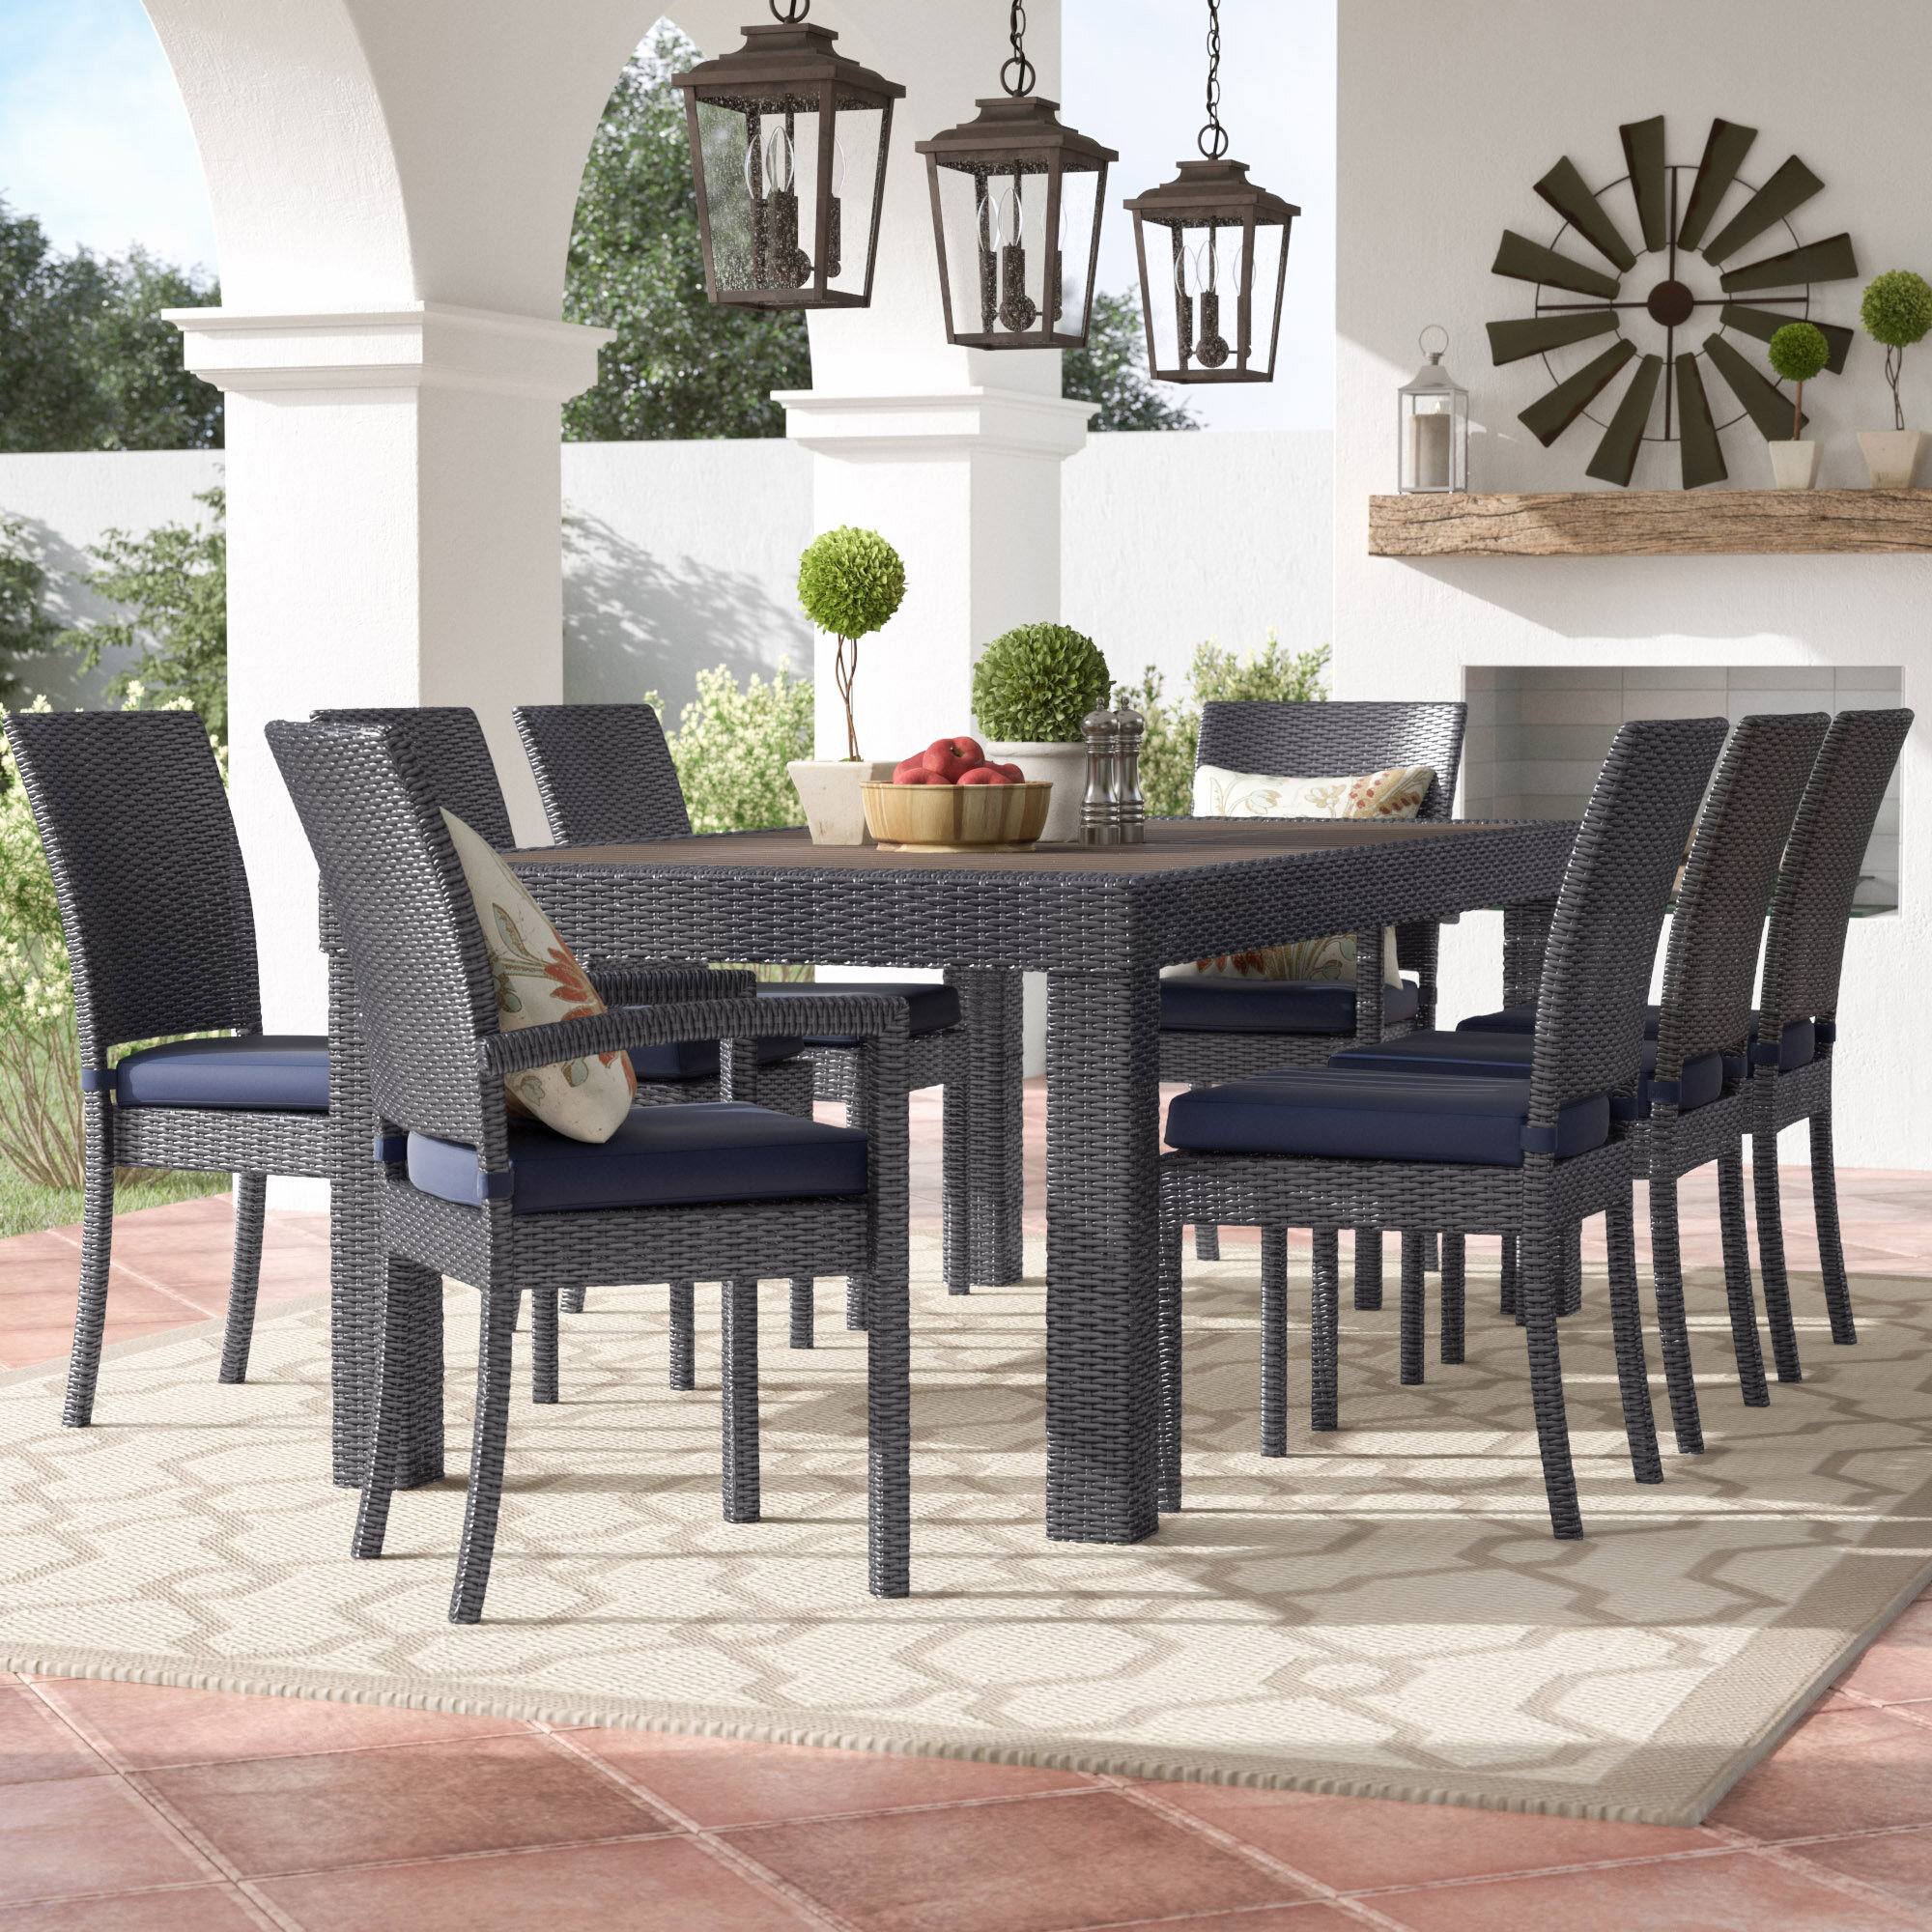 Three Posts Northridge 9 Piece Sunbrella Dining Set With Cushion Reviews Wayfair